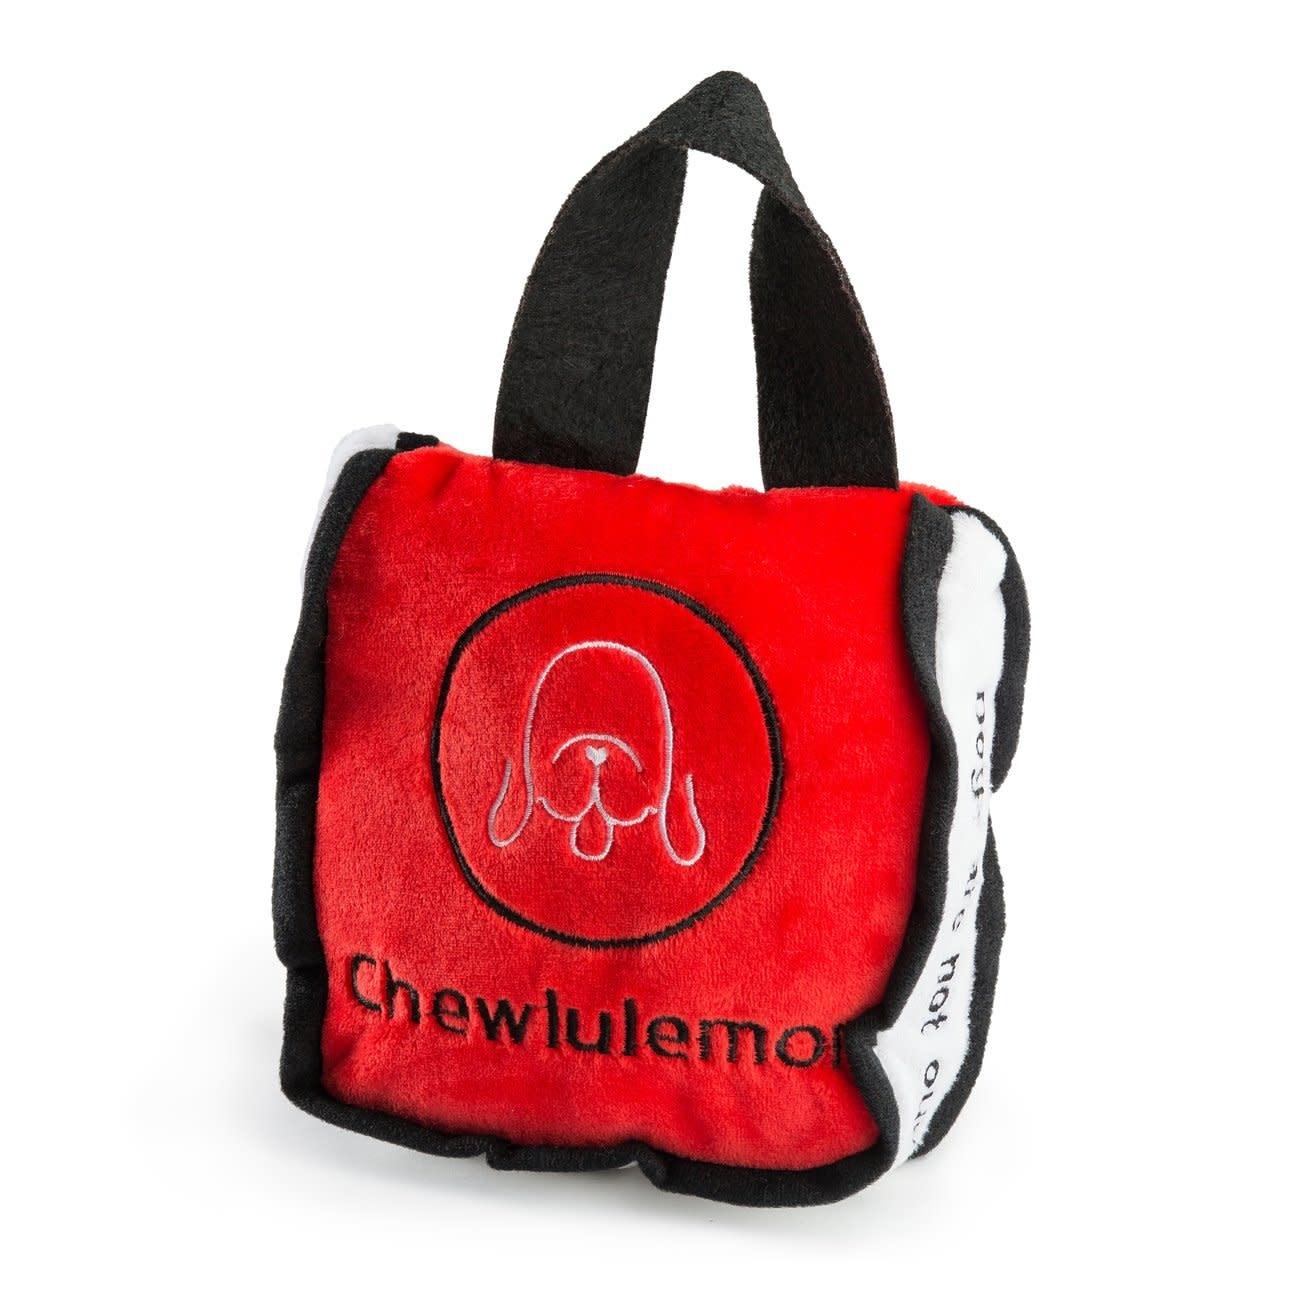 Chewlulemon Bag Toy